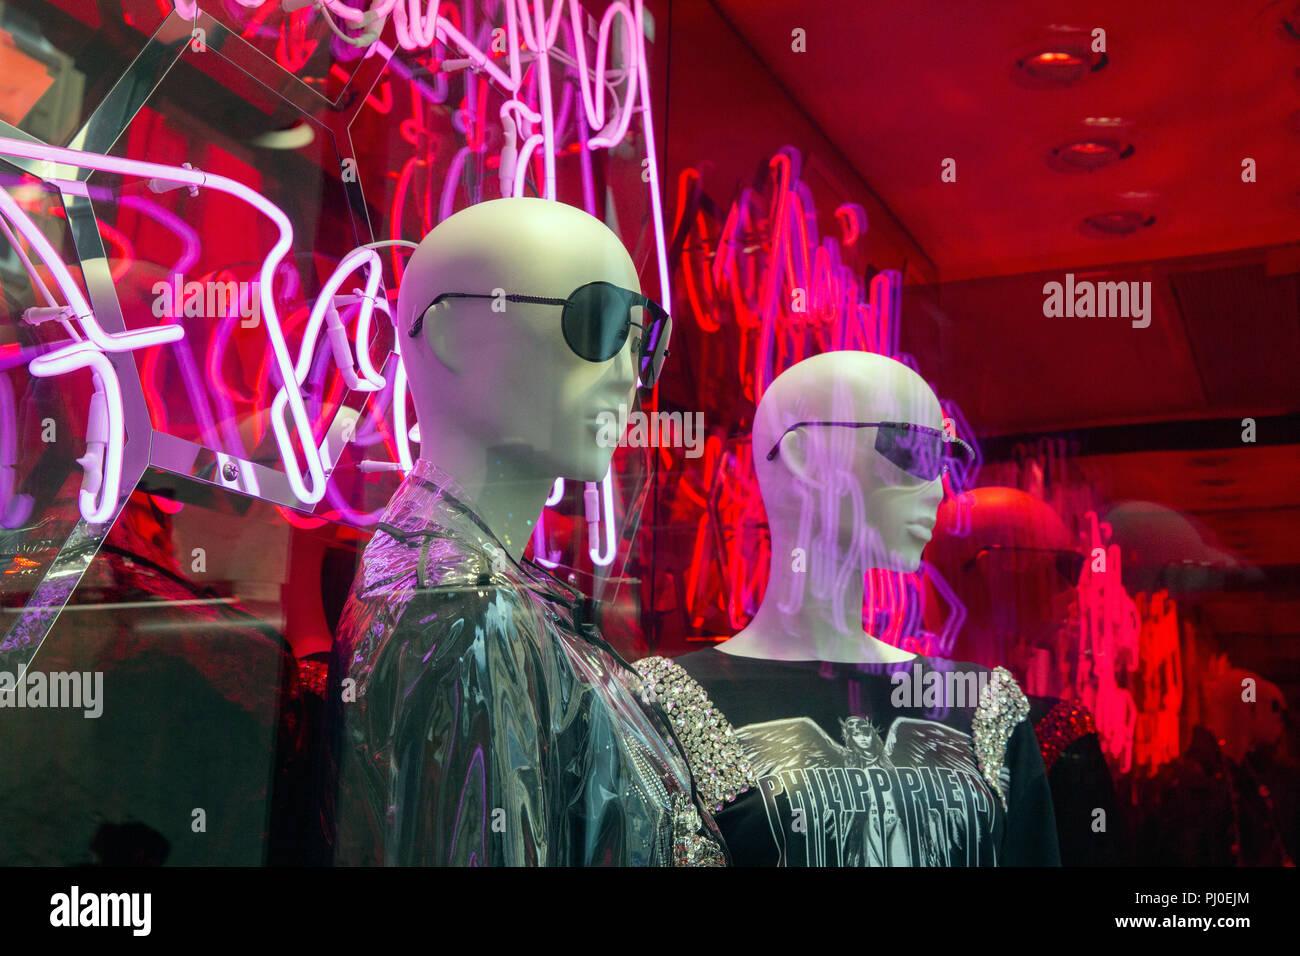 028a7344595 Window display at the Philipp Plein Store on New Bond Street, London ...